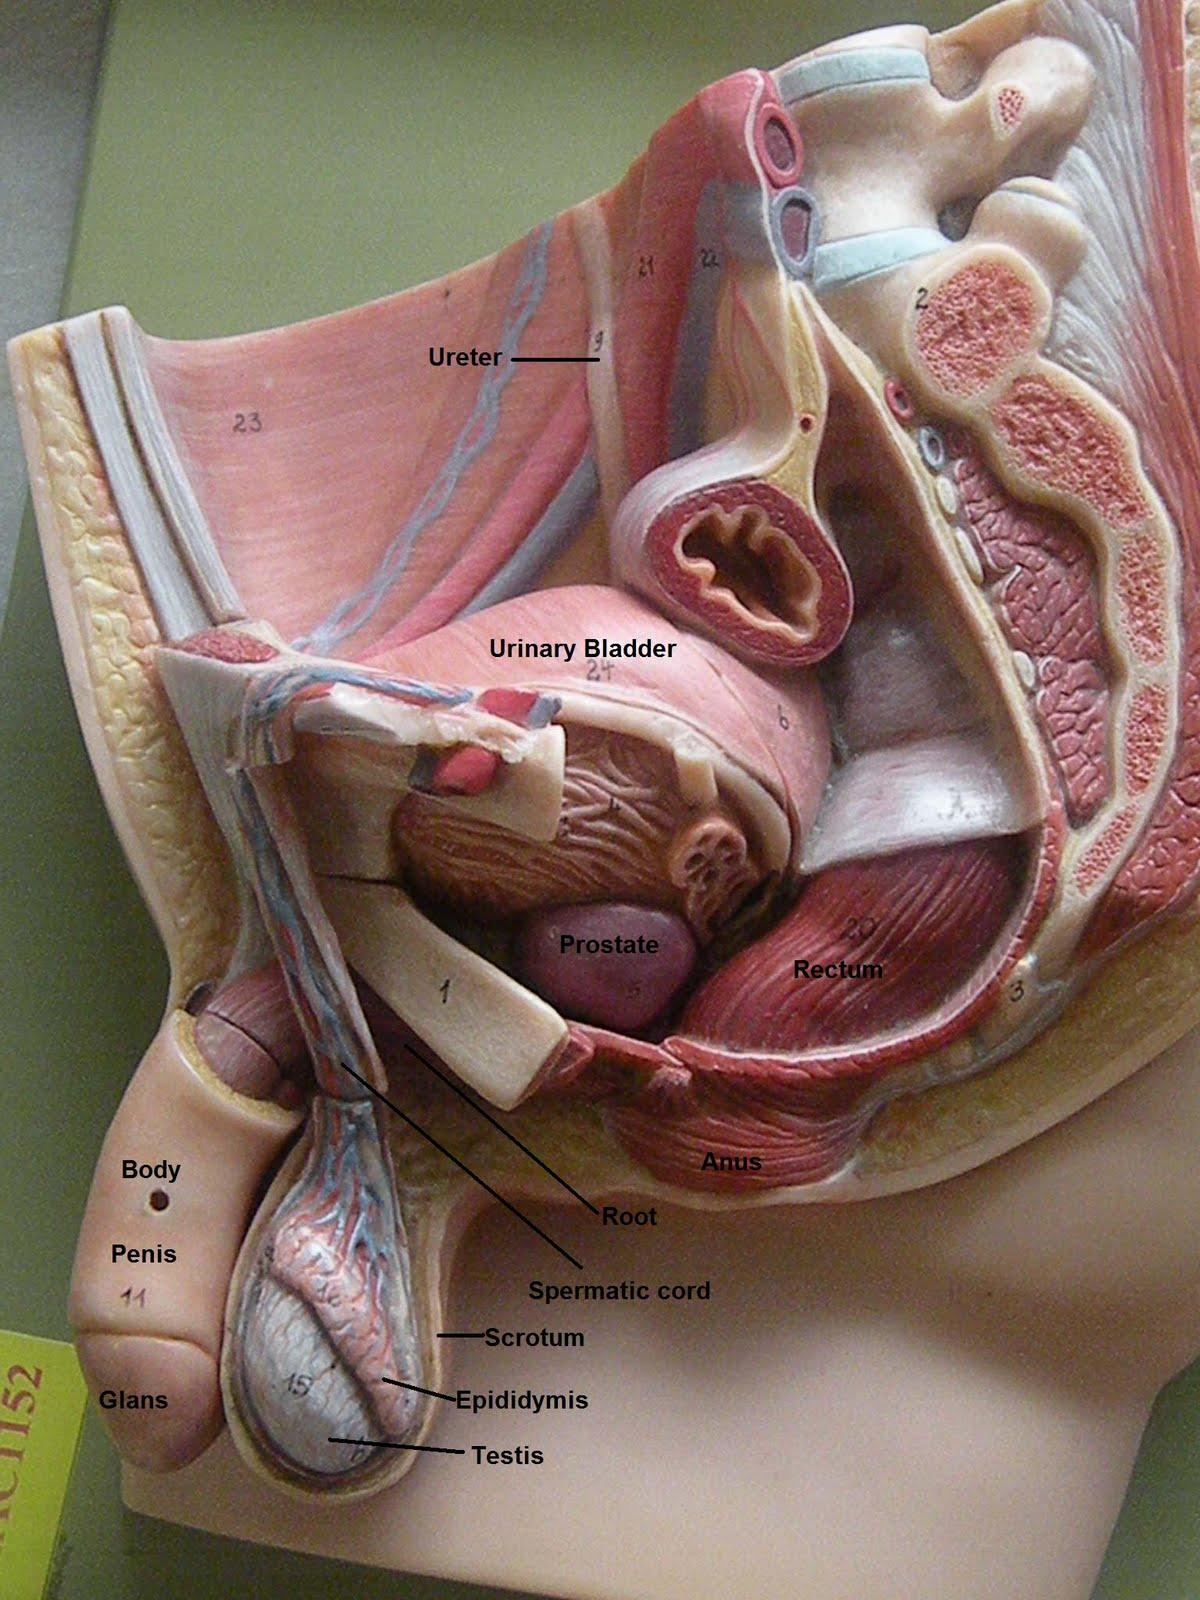 http://2.bp.blogspot.com/_v2mTJ6OoLAo/TPWb-hXko_I/AAAAAAAAAIE/Ck8DSFrzkL4/s1600/Male+Reproductive+System.jpg